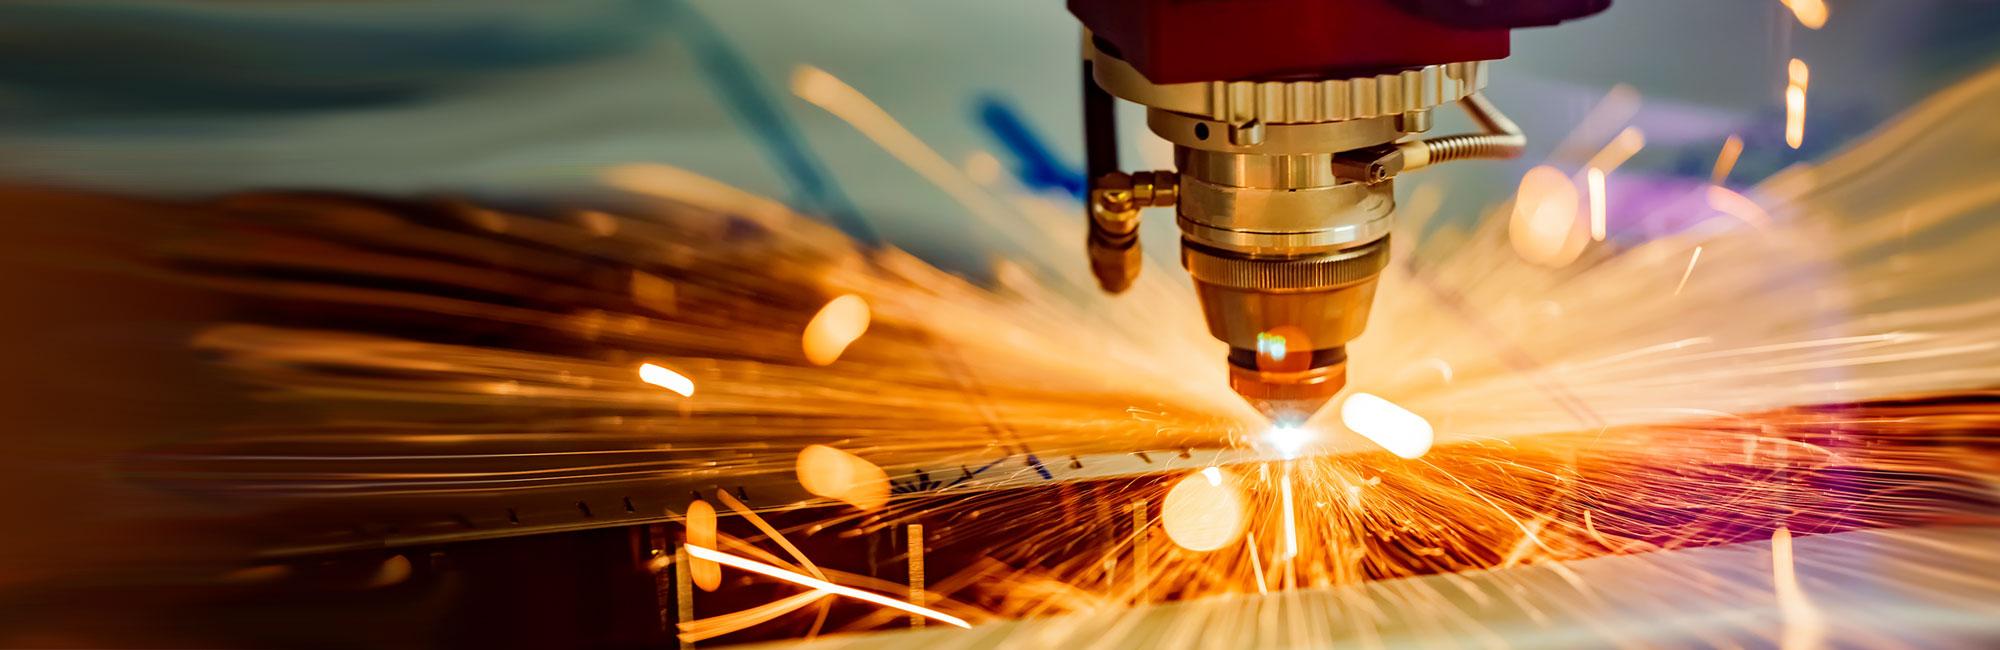 Fab X Industries laser fabrication